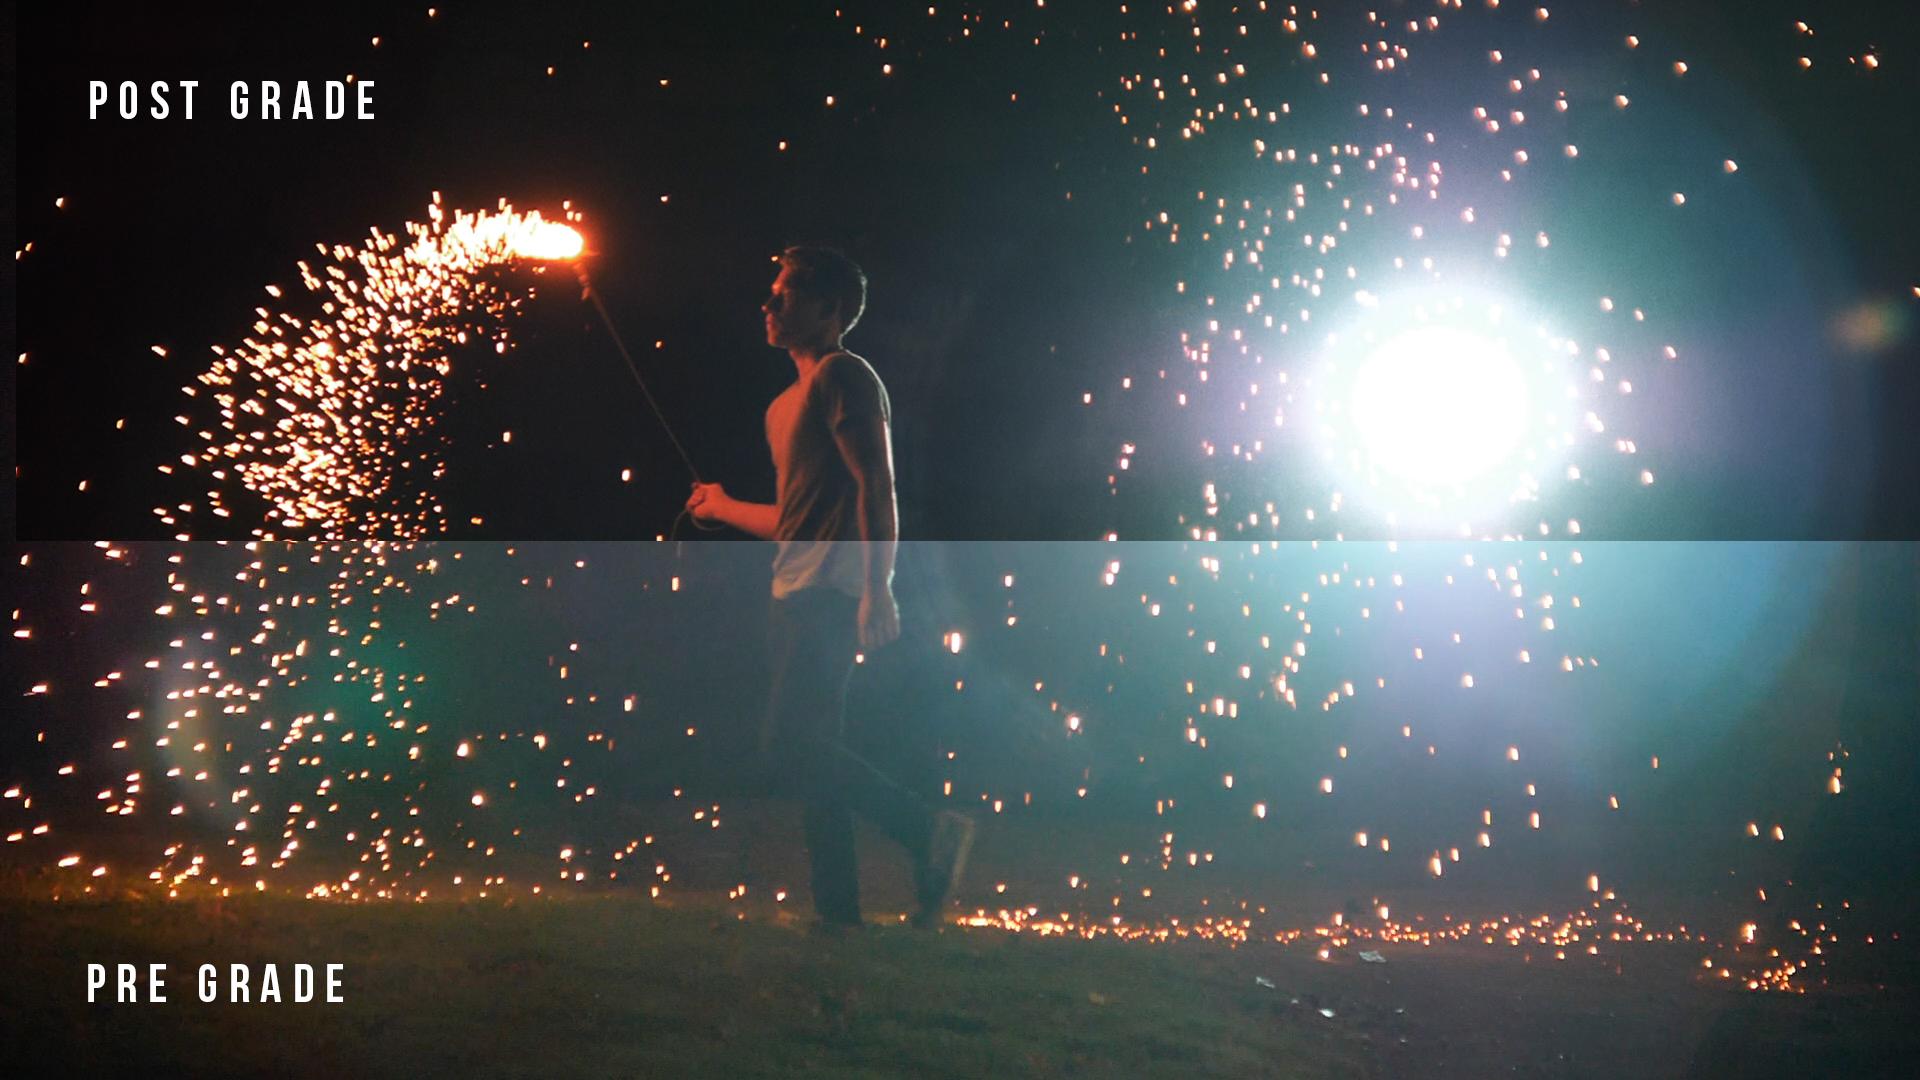 color grading split showing steel wool fire sparkler in music video